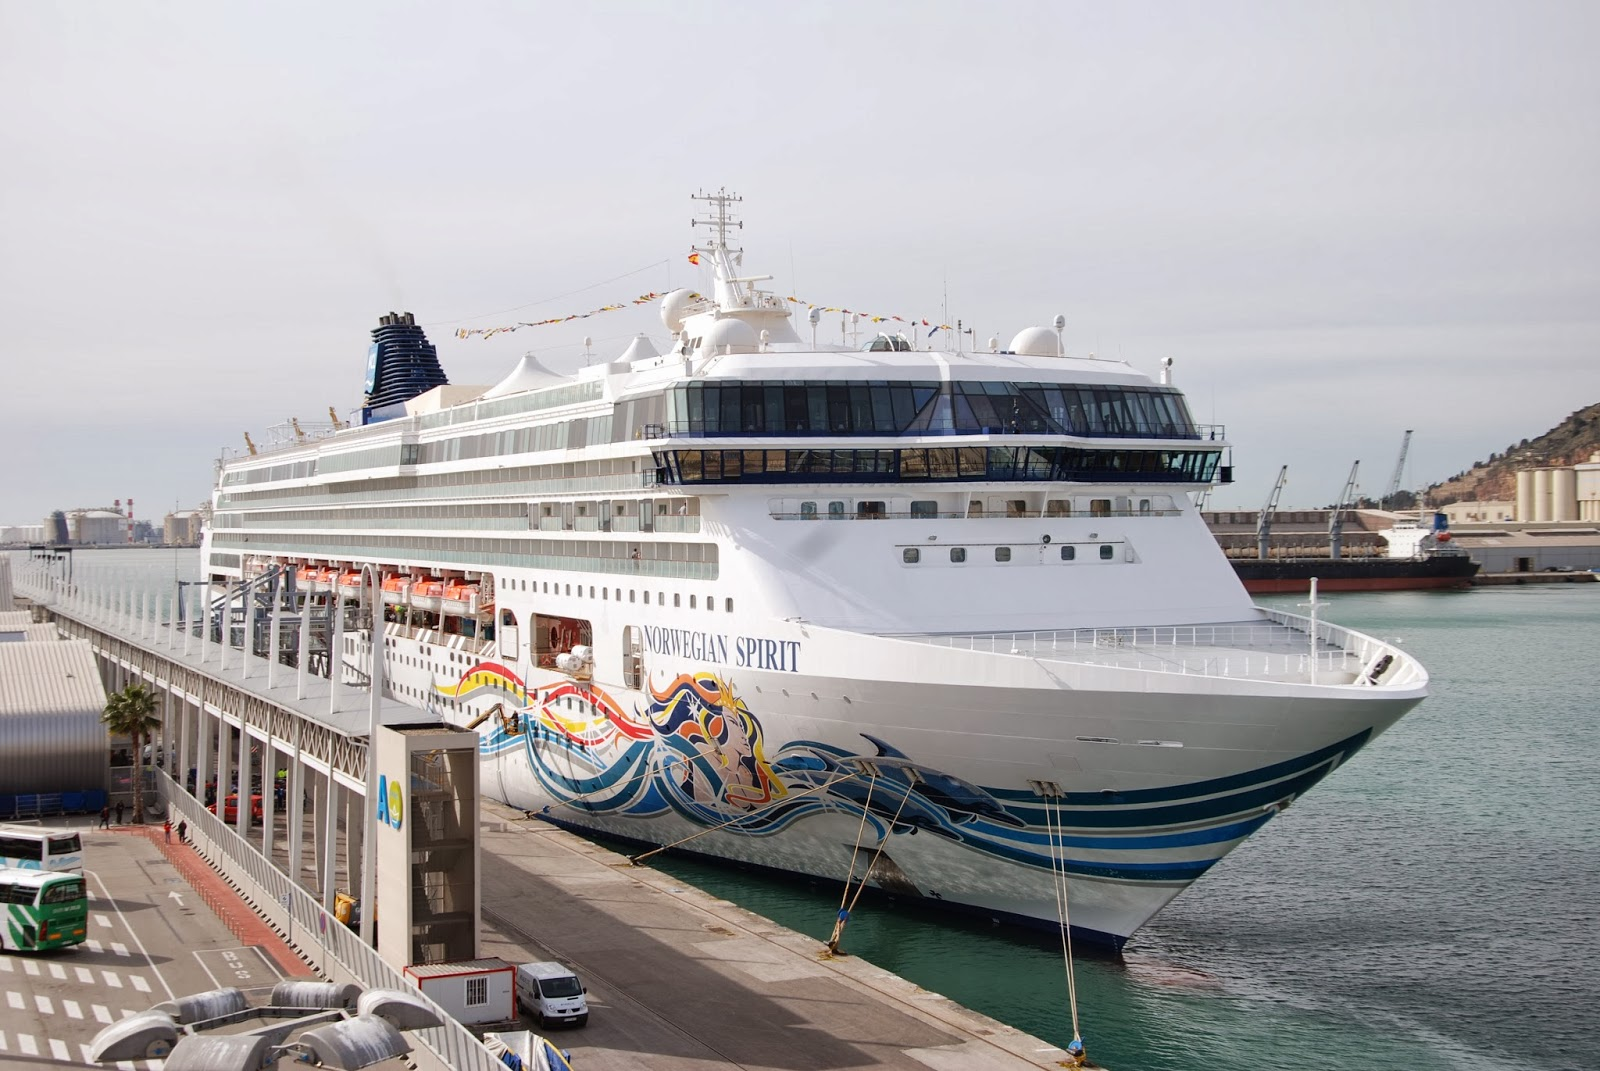 NAVIGATIONCruising And Maritime Themes February 2014